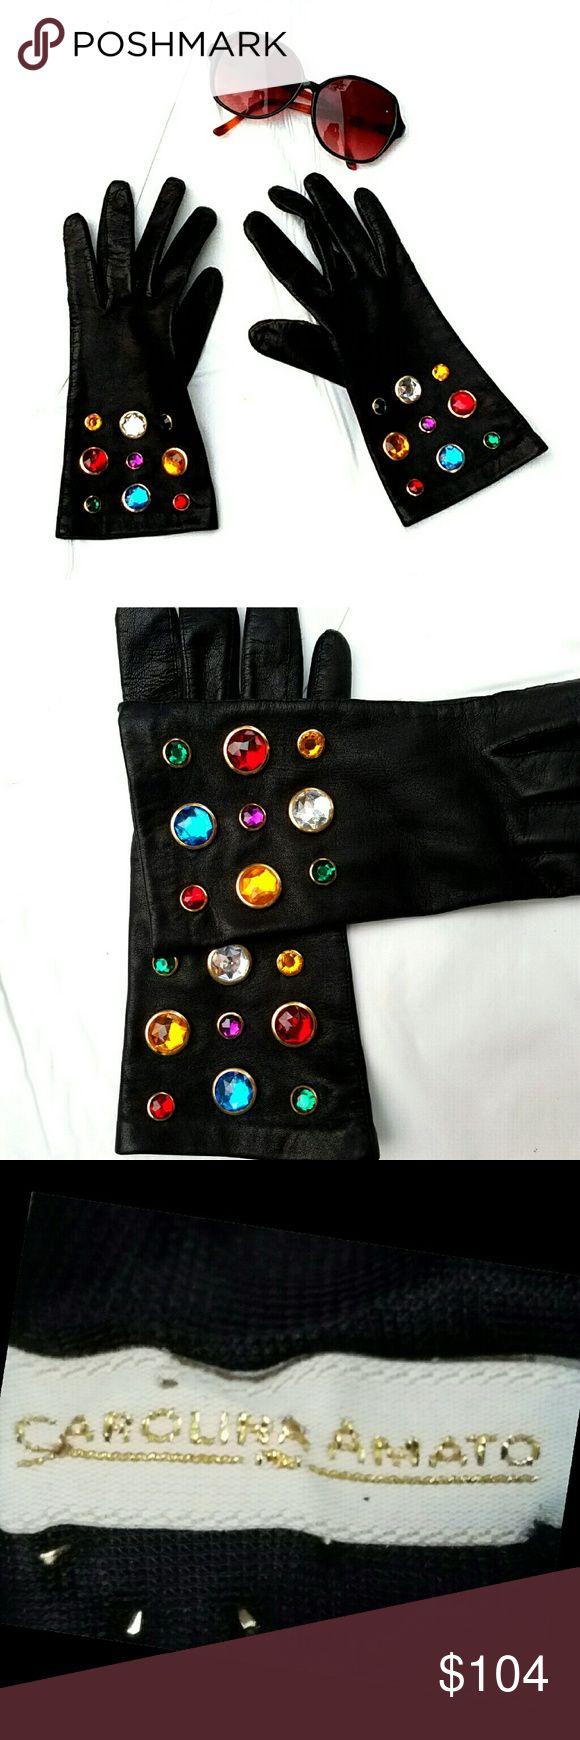 Xxl black leather gloves - Vtg Carolina Amato Bejeweled Black Leather Gloves